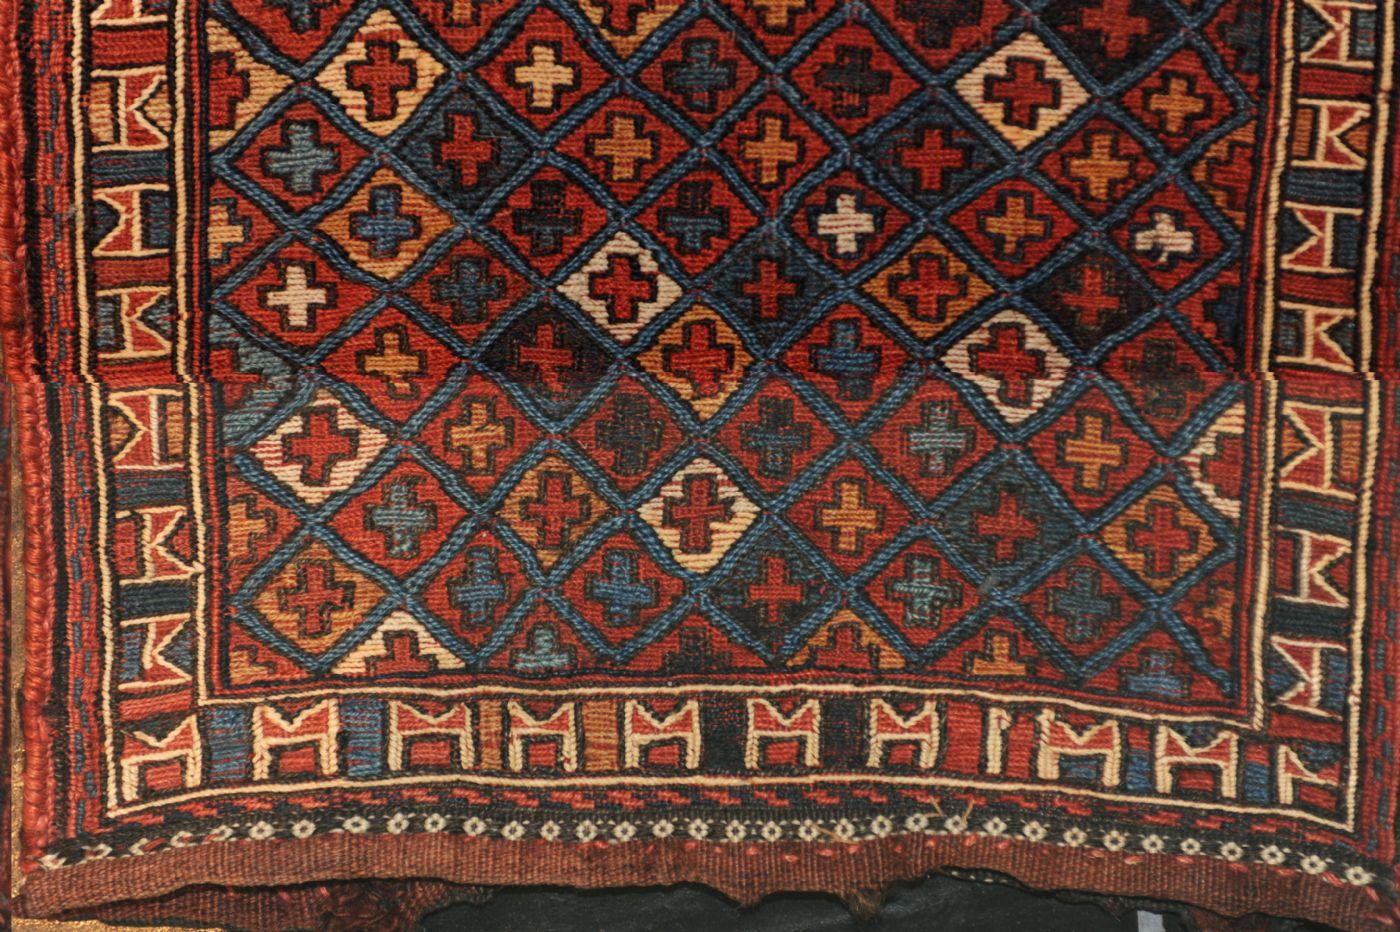 thumb3|Persian Saddlebag, antique ca. 36 x 30 cm